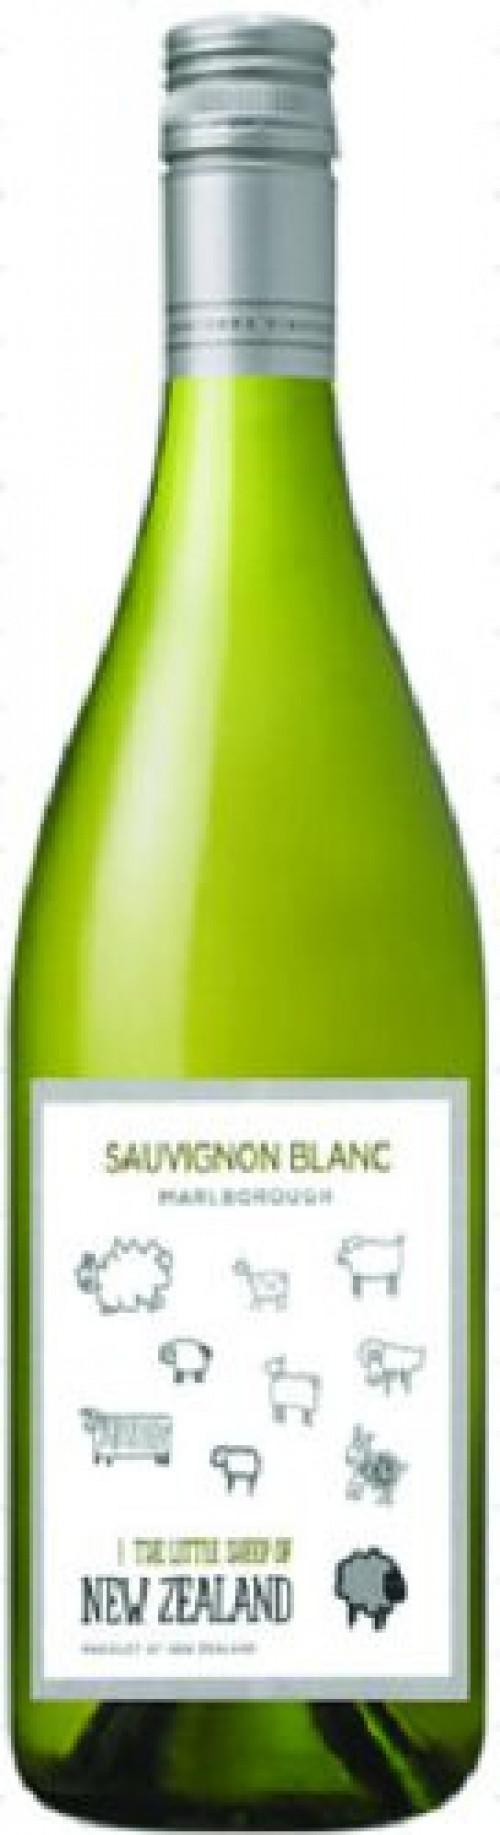 2020 The Little Sheep Sauvignon Blanc 750ml